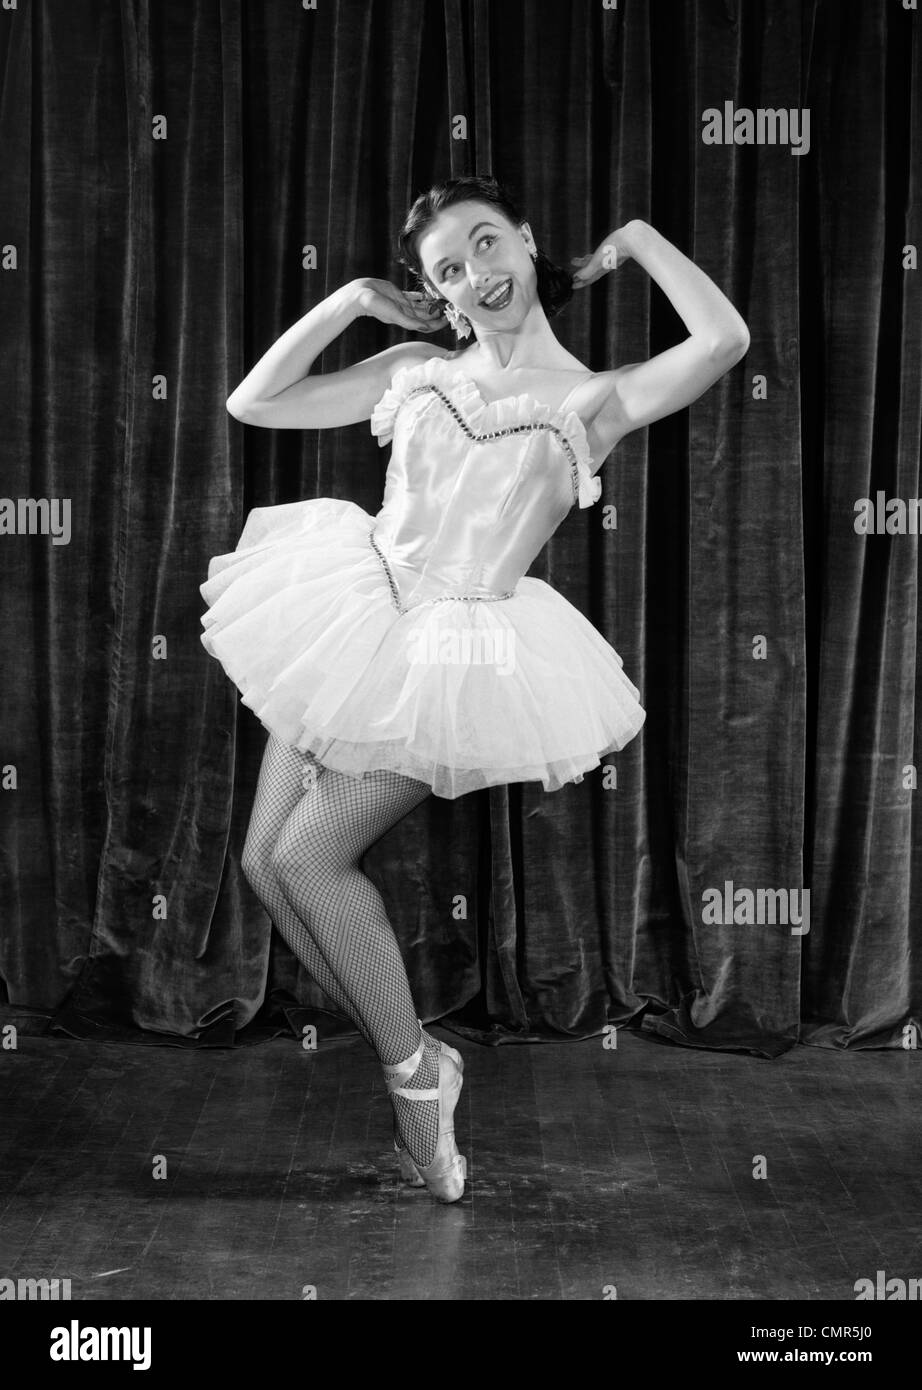 1950s BALLERINA ON TOES - Stock Image